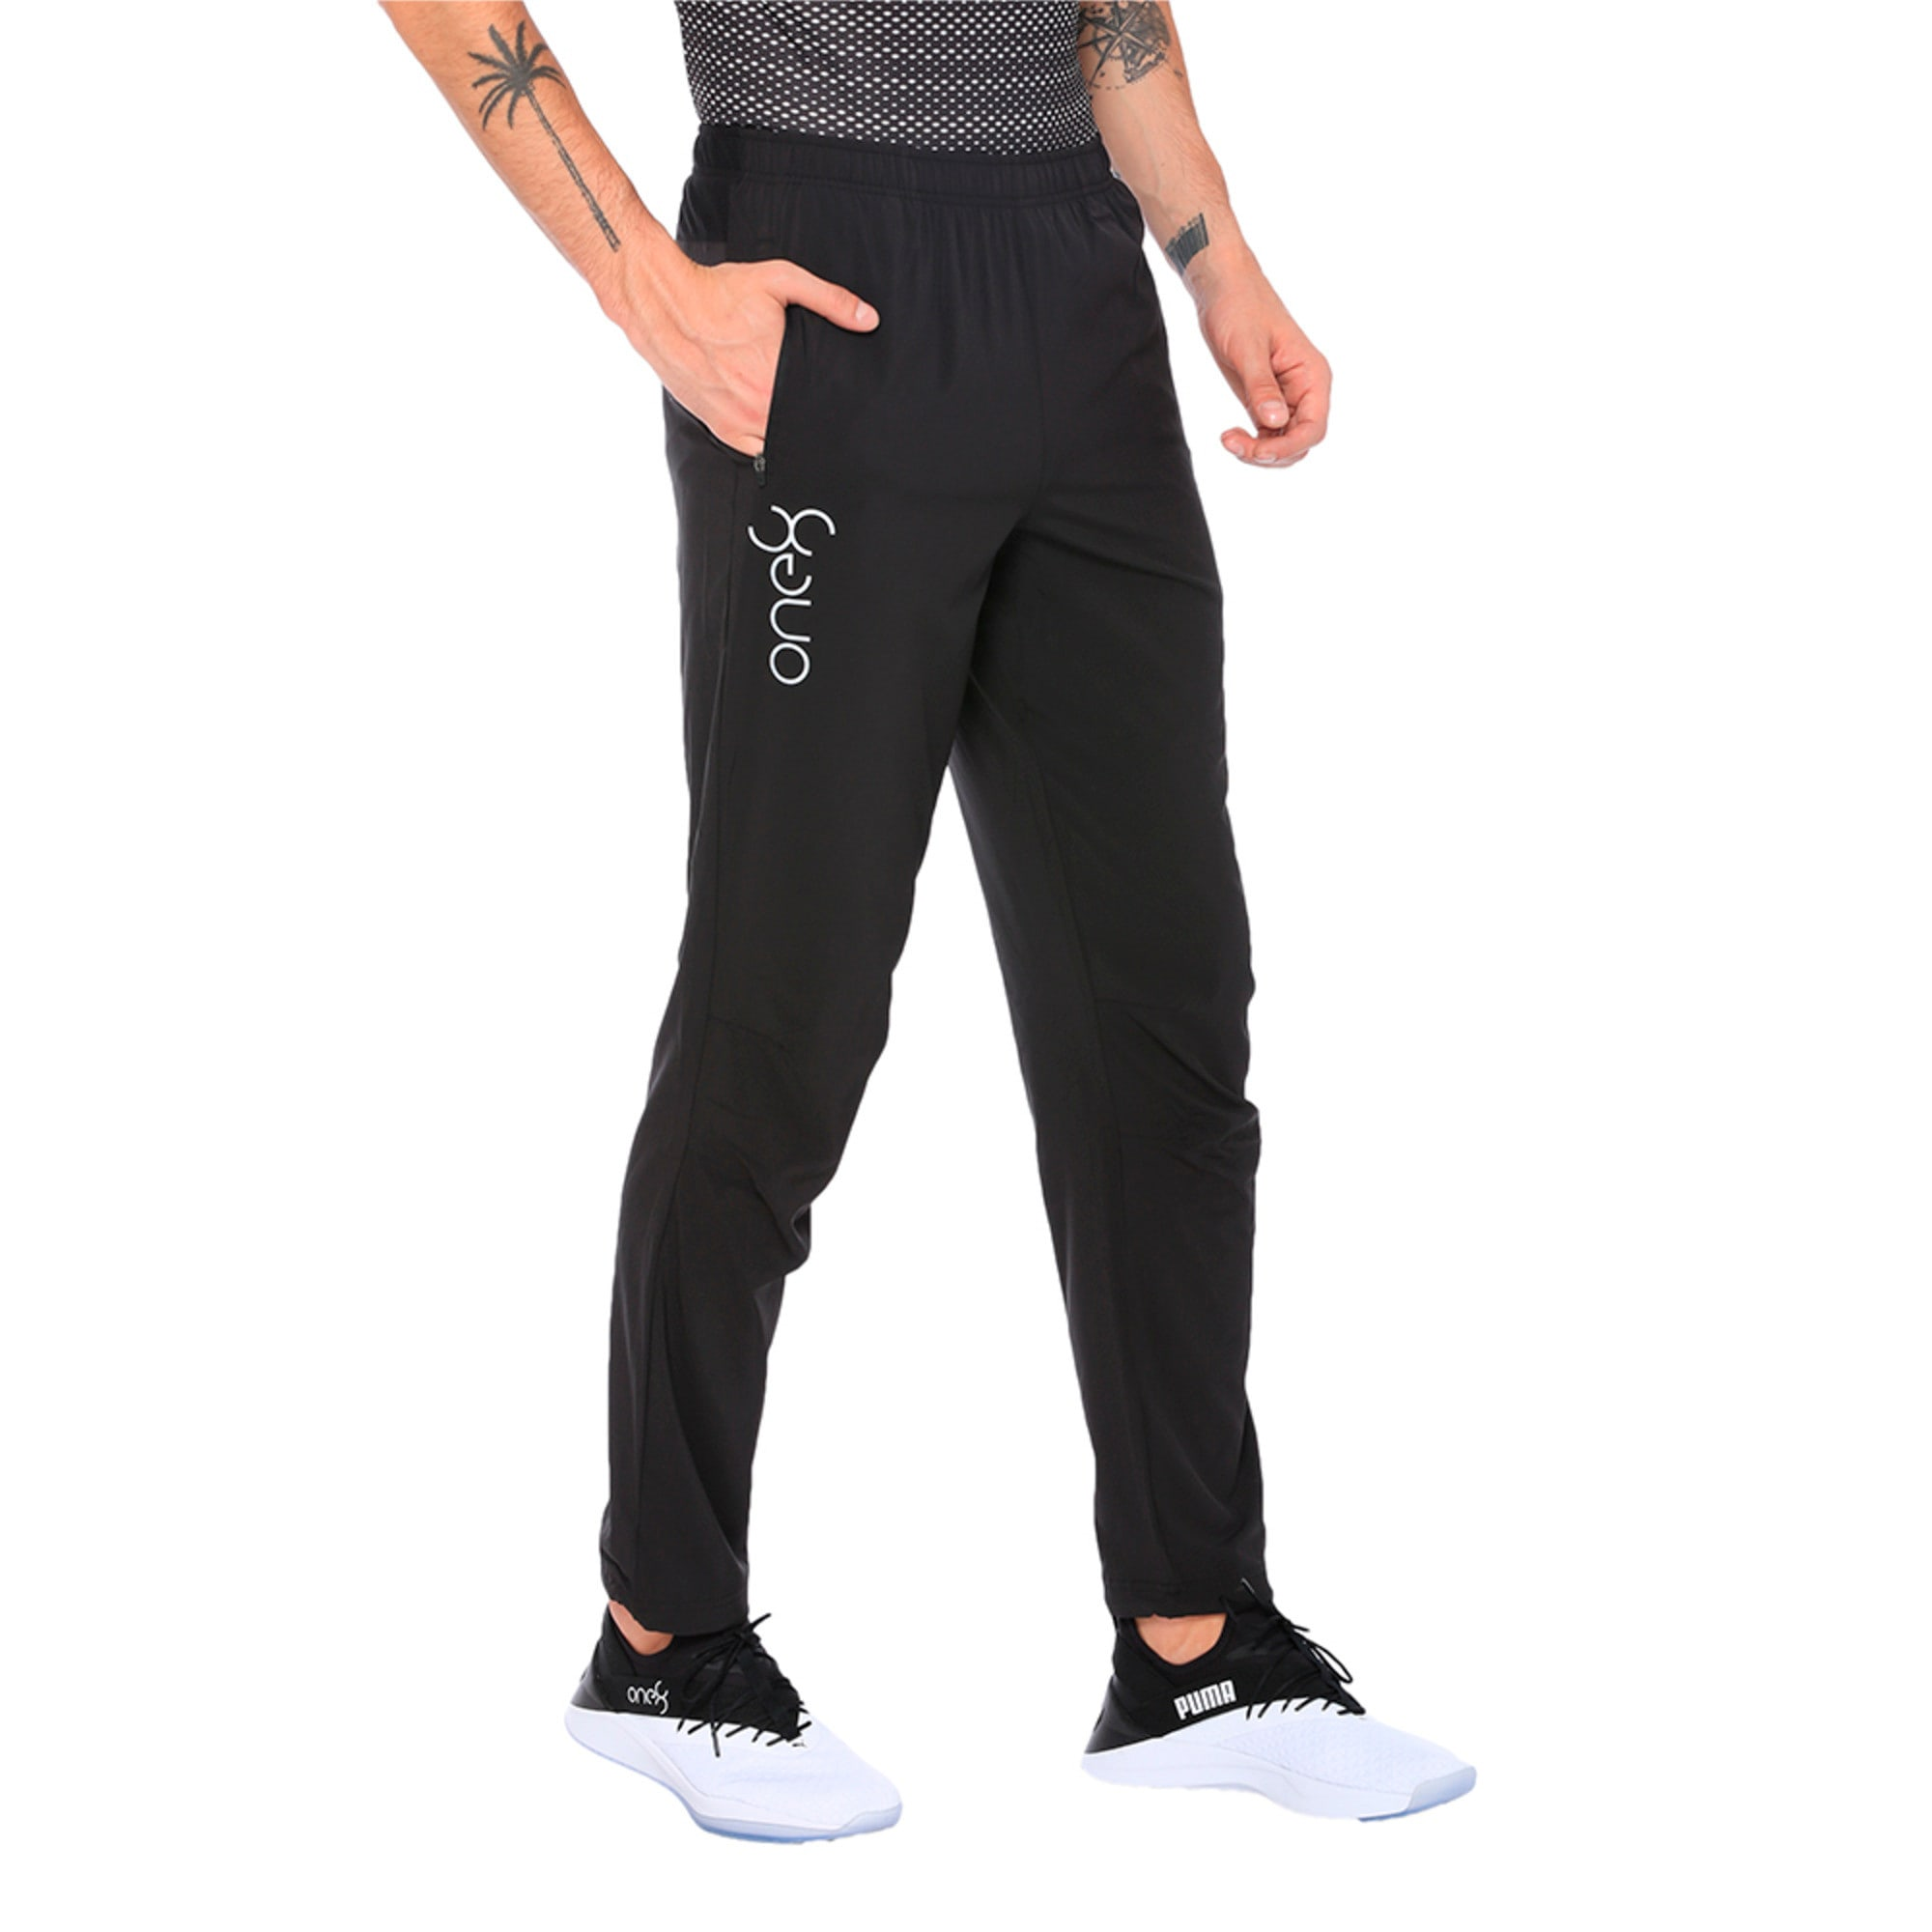 Thumbnail 2 of one8 VK Men's Active Pants, Puma Black, medium-IND